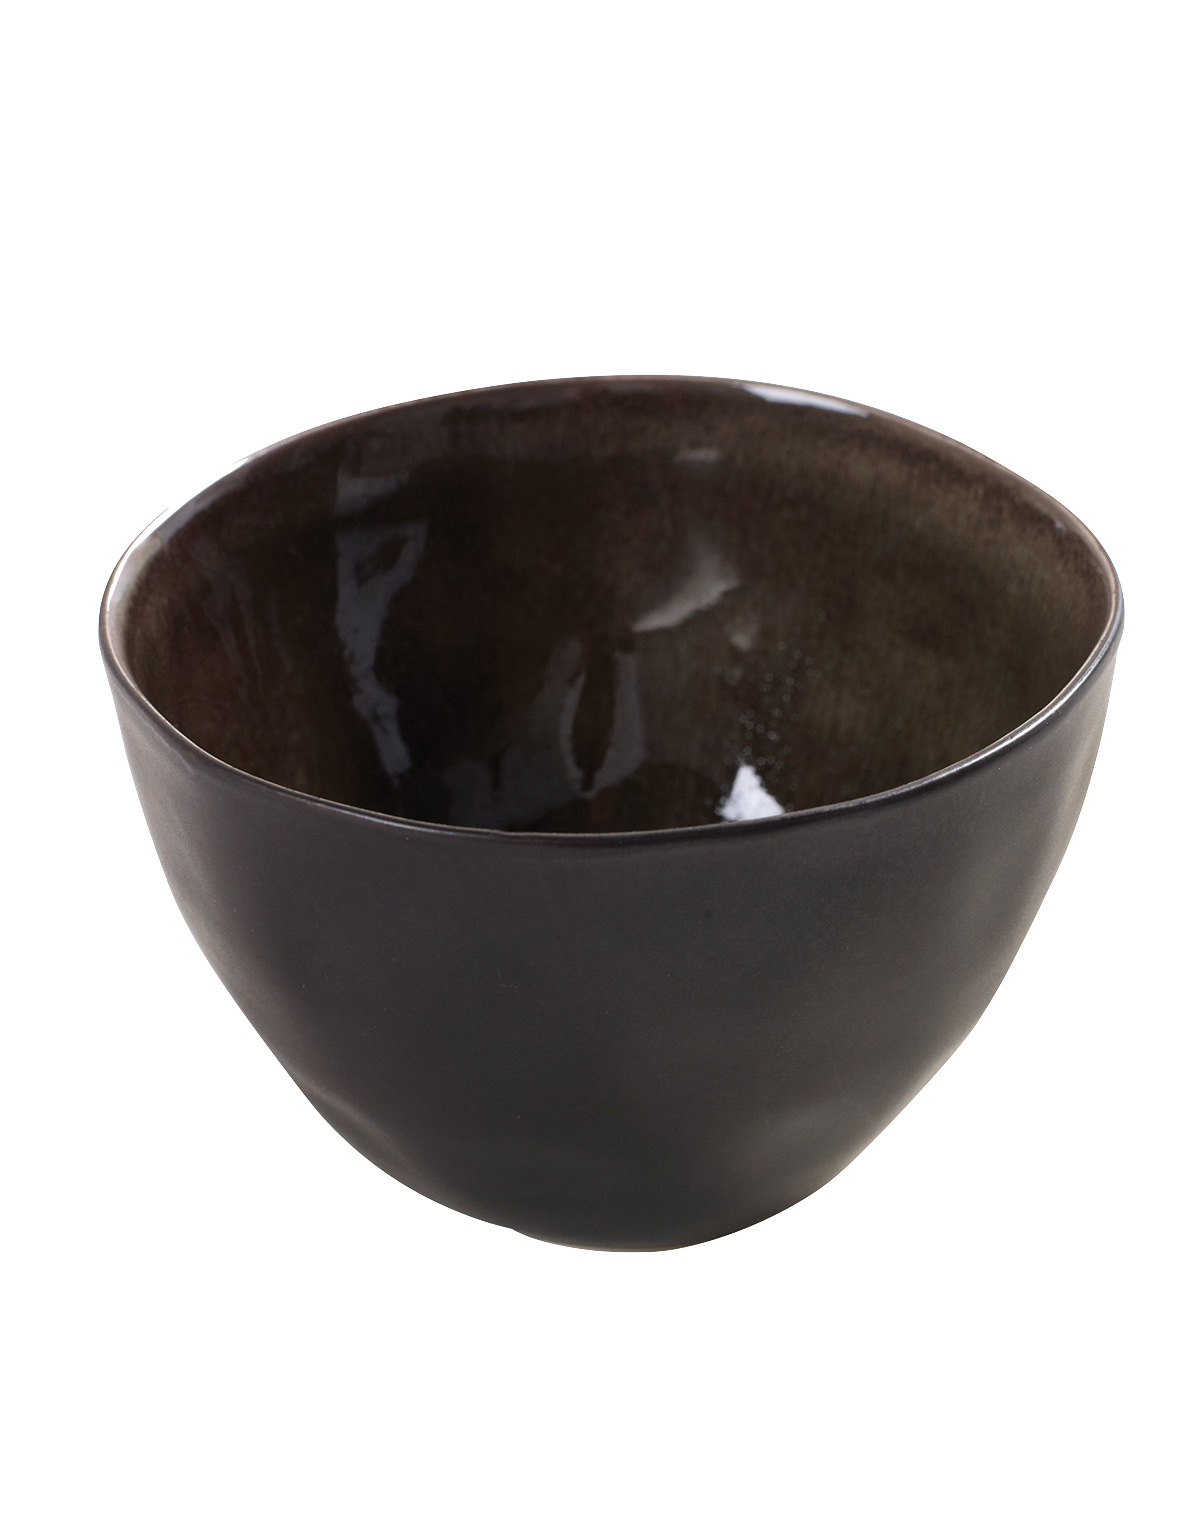 Bowl Pascale Naessens-4